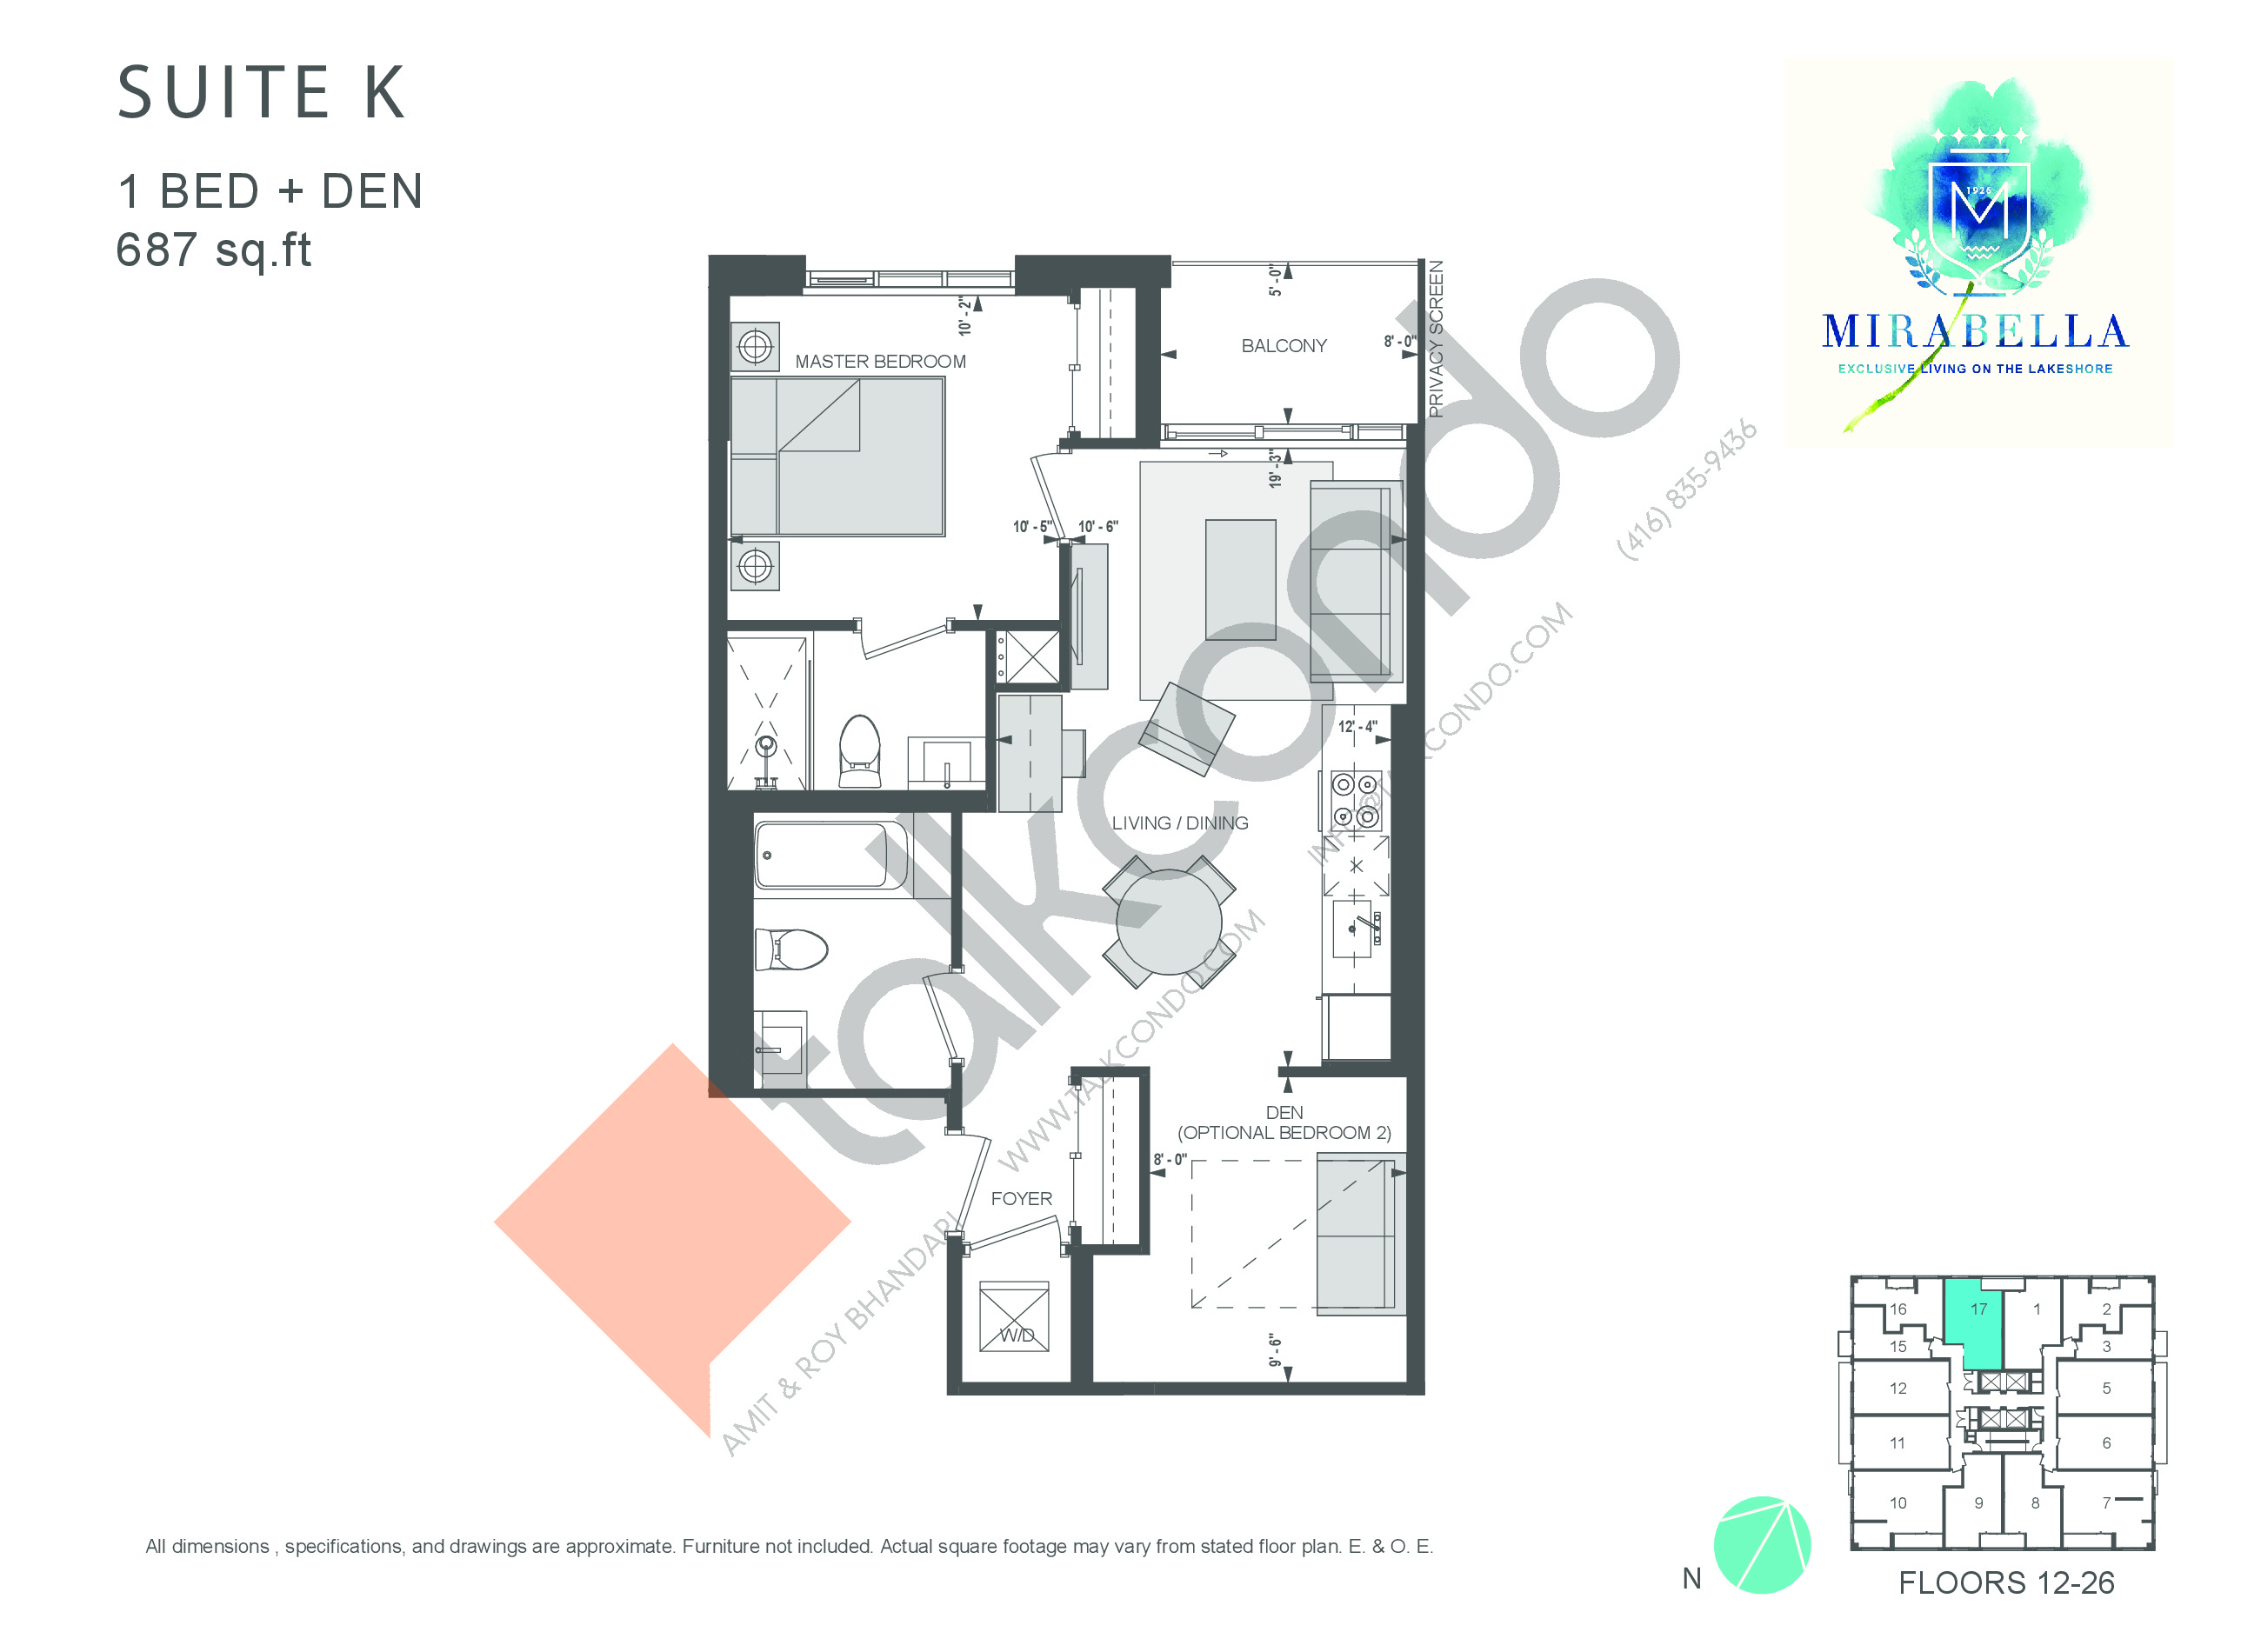 Suite K Floor Plan at Mirabella Luxury Condos East Tower - 687 sq.ft